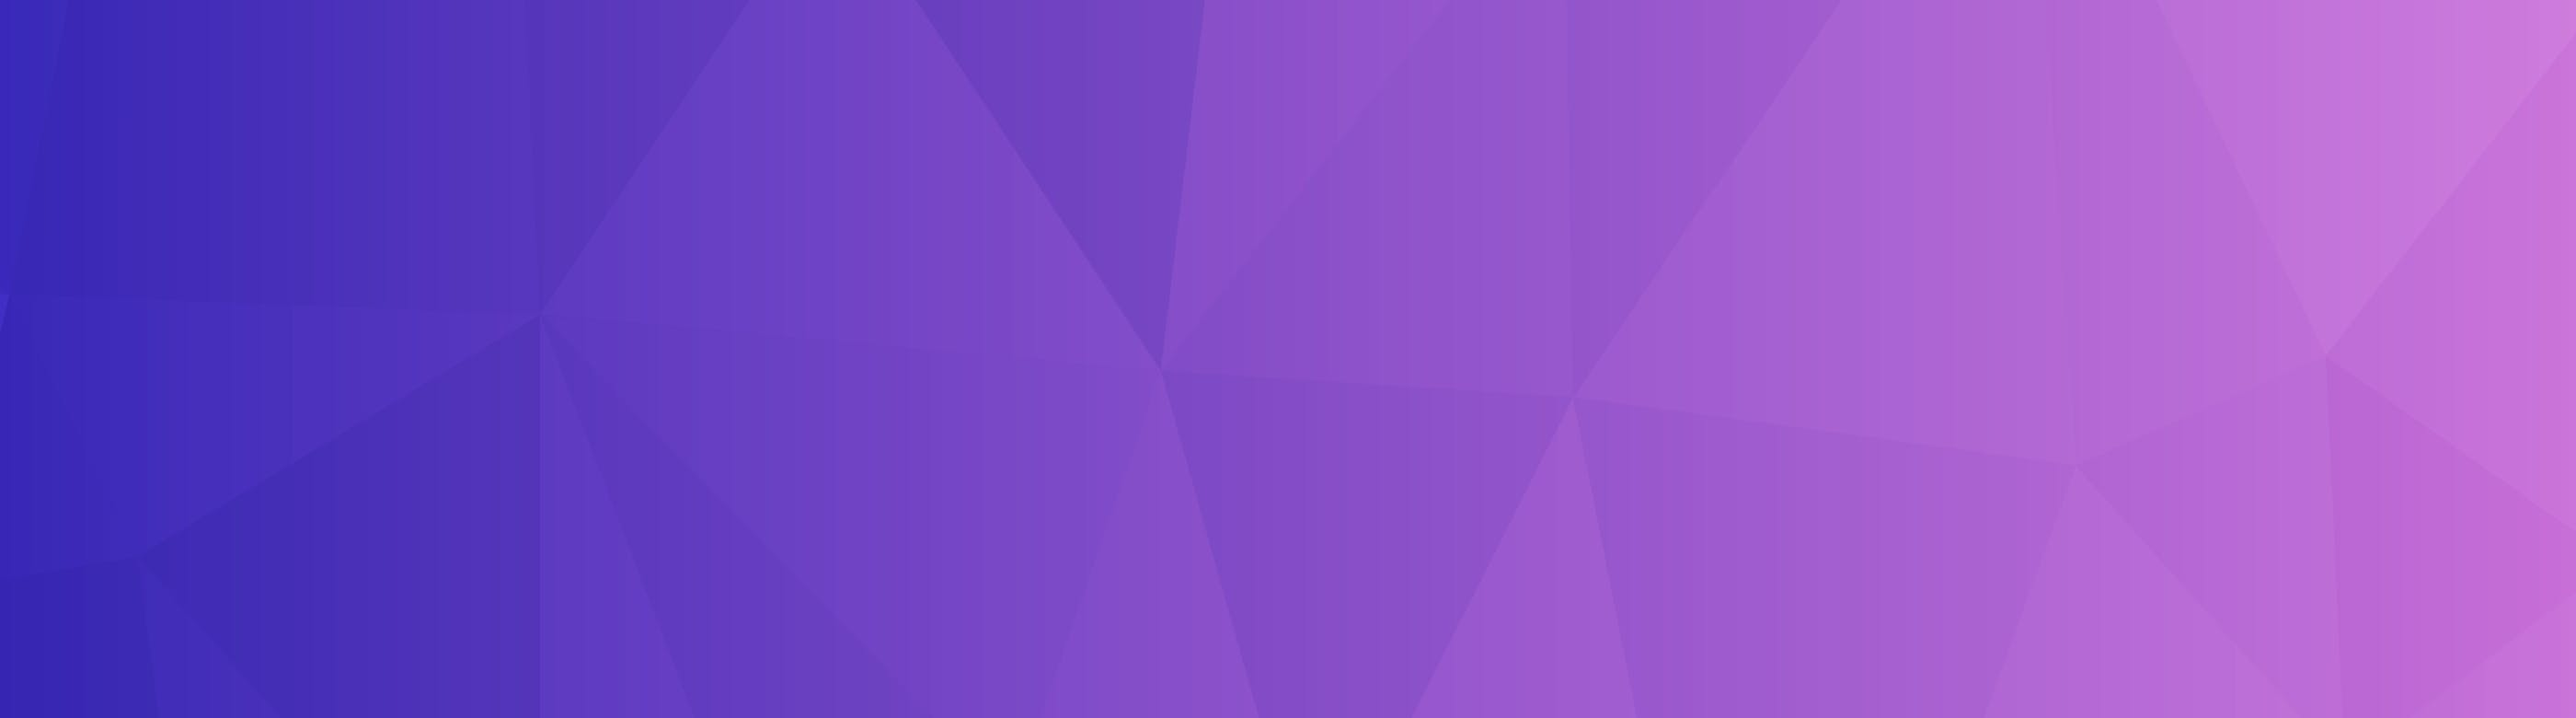 purple-pink-tri-bg.png